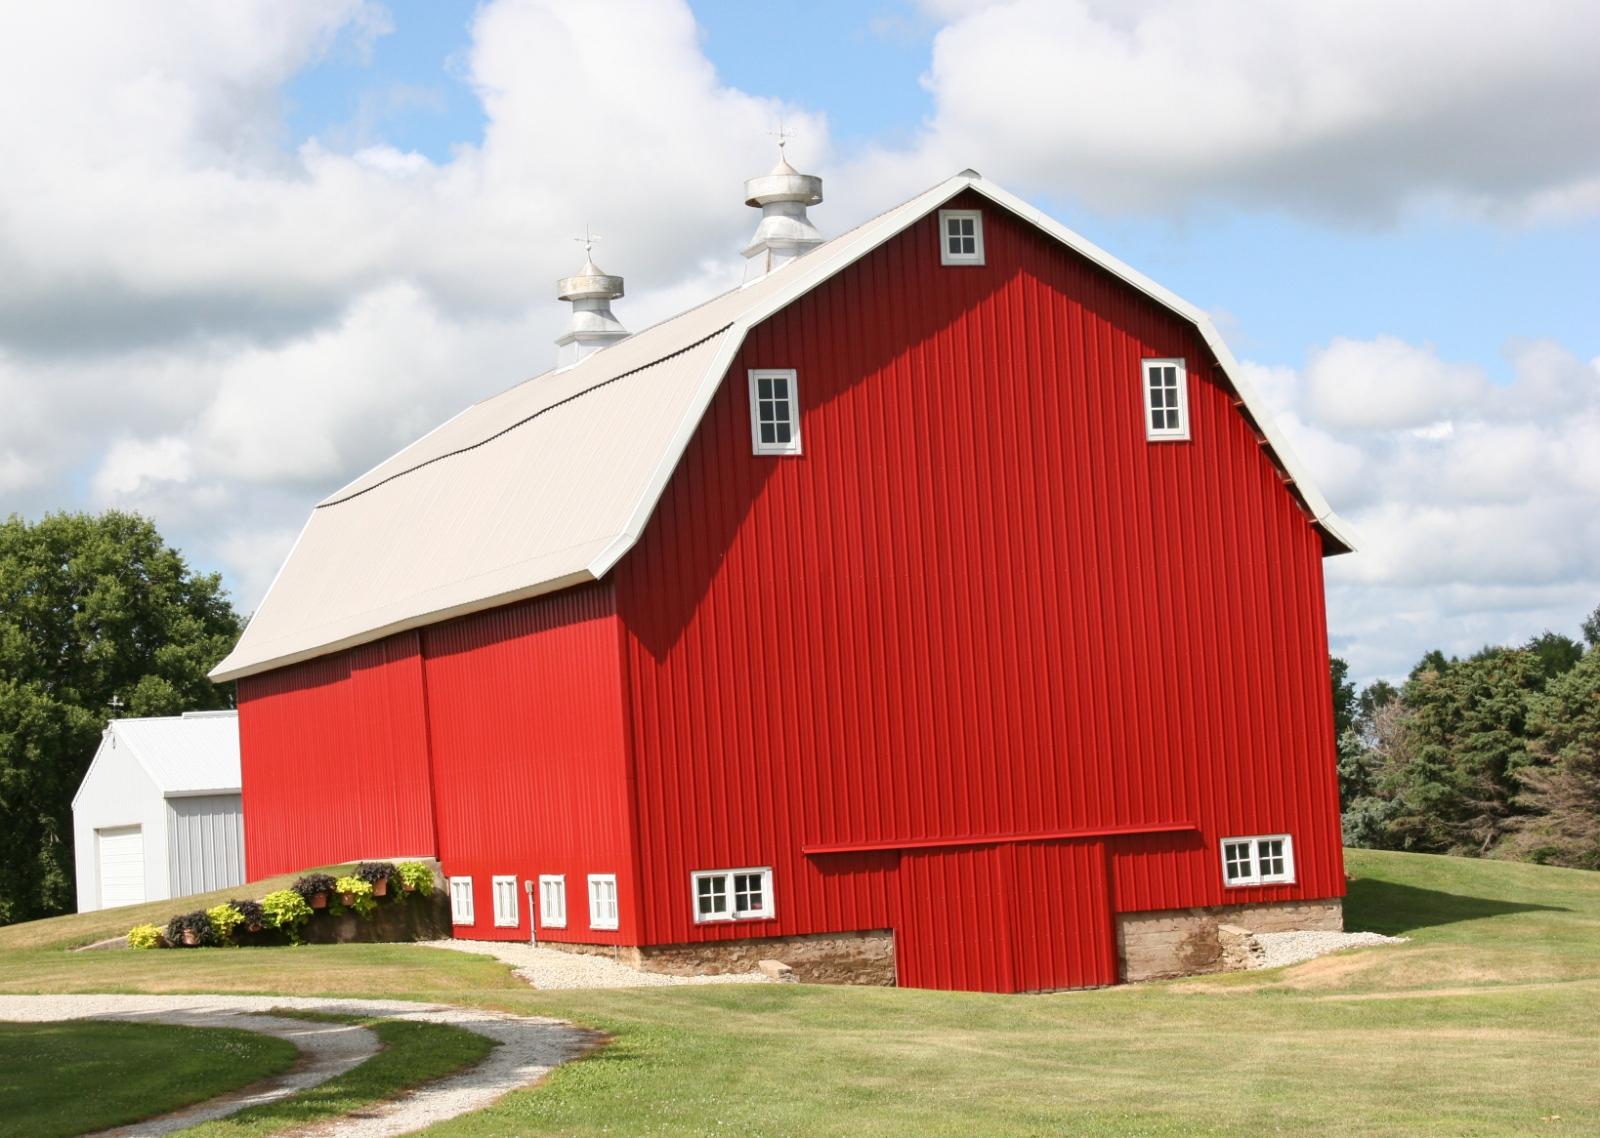 Of gravel roads, barns & cornfields